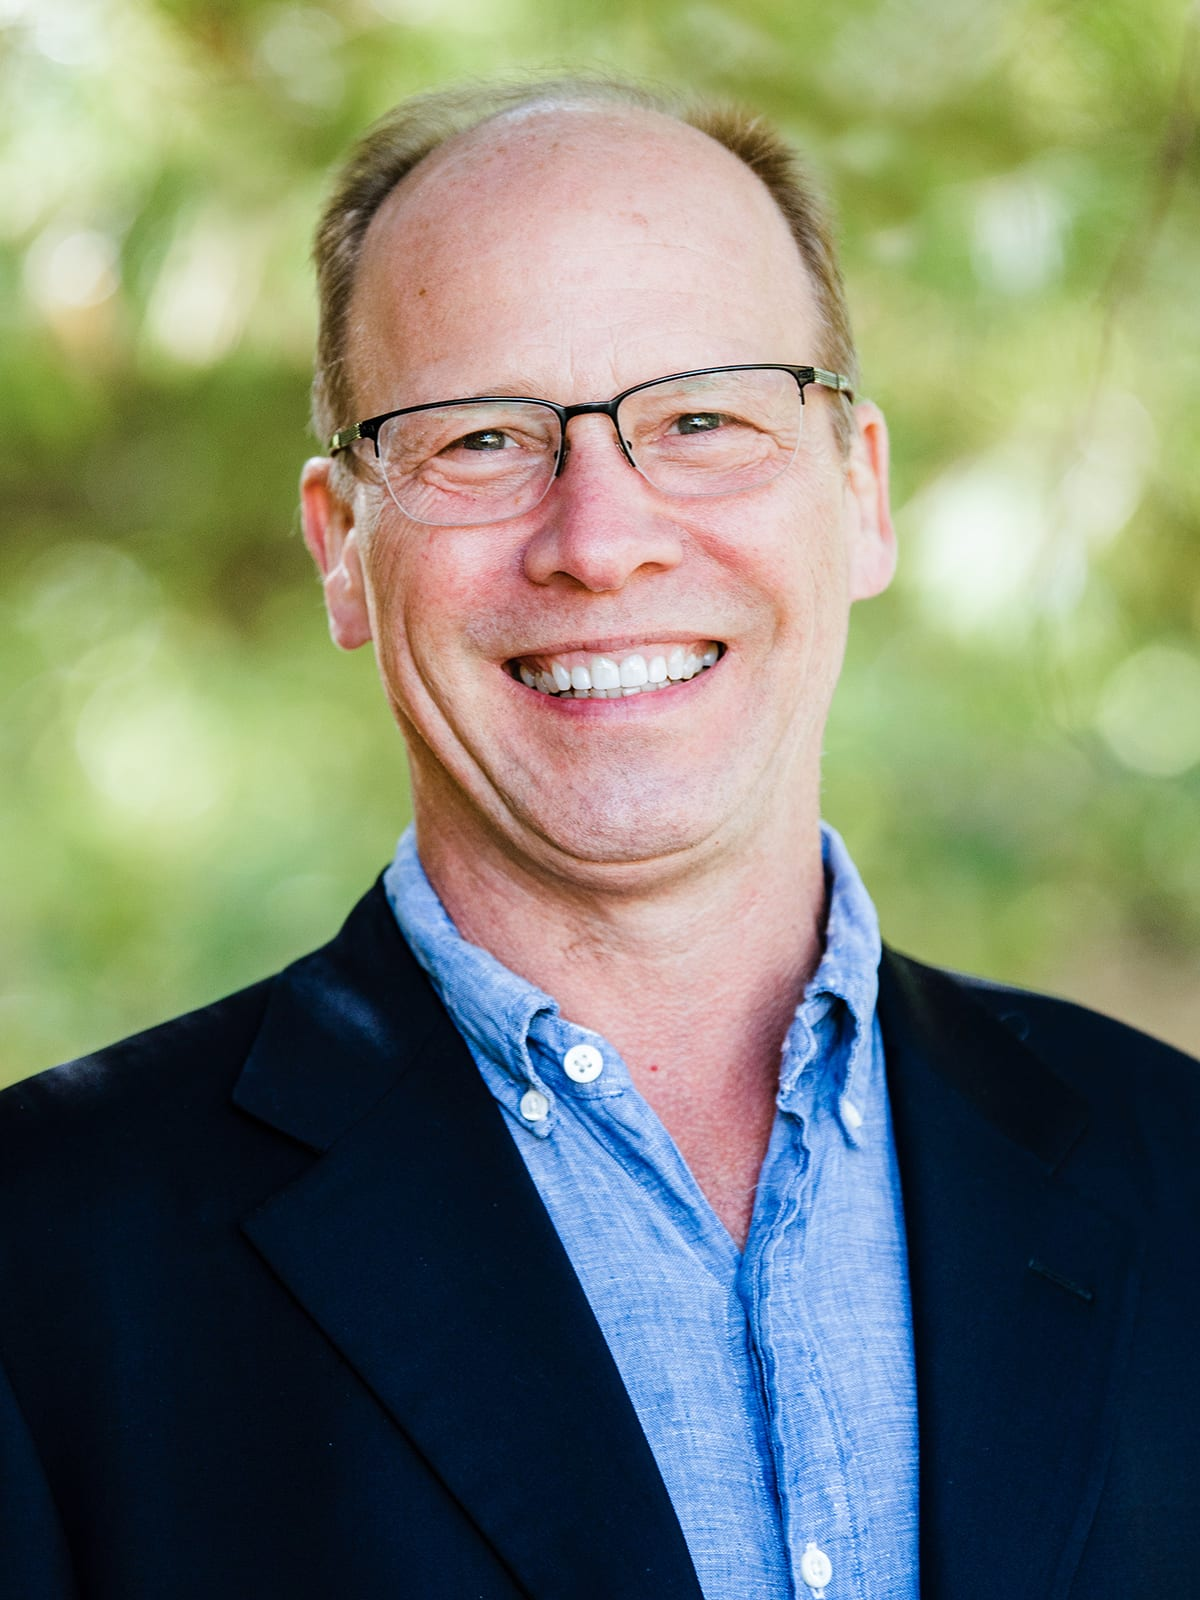 Peter De Menocal